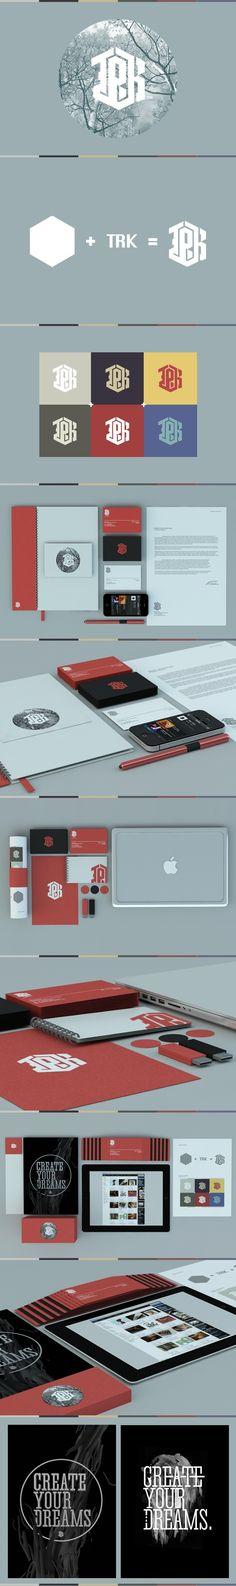 Peter Tarka identity system   #stationary #corporate #design #corporatedesign #identity #branding #marketing < repinned by www.BlickeDeeler.de   Take a look at www.LogoGestaltung-Hamburg.de